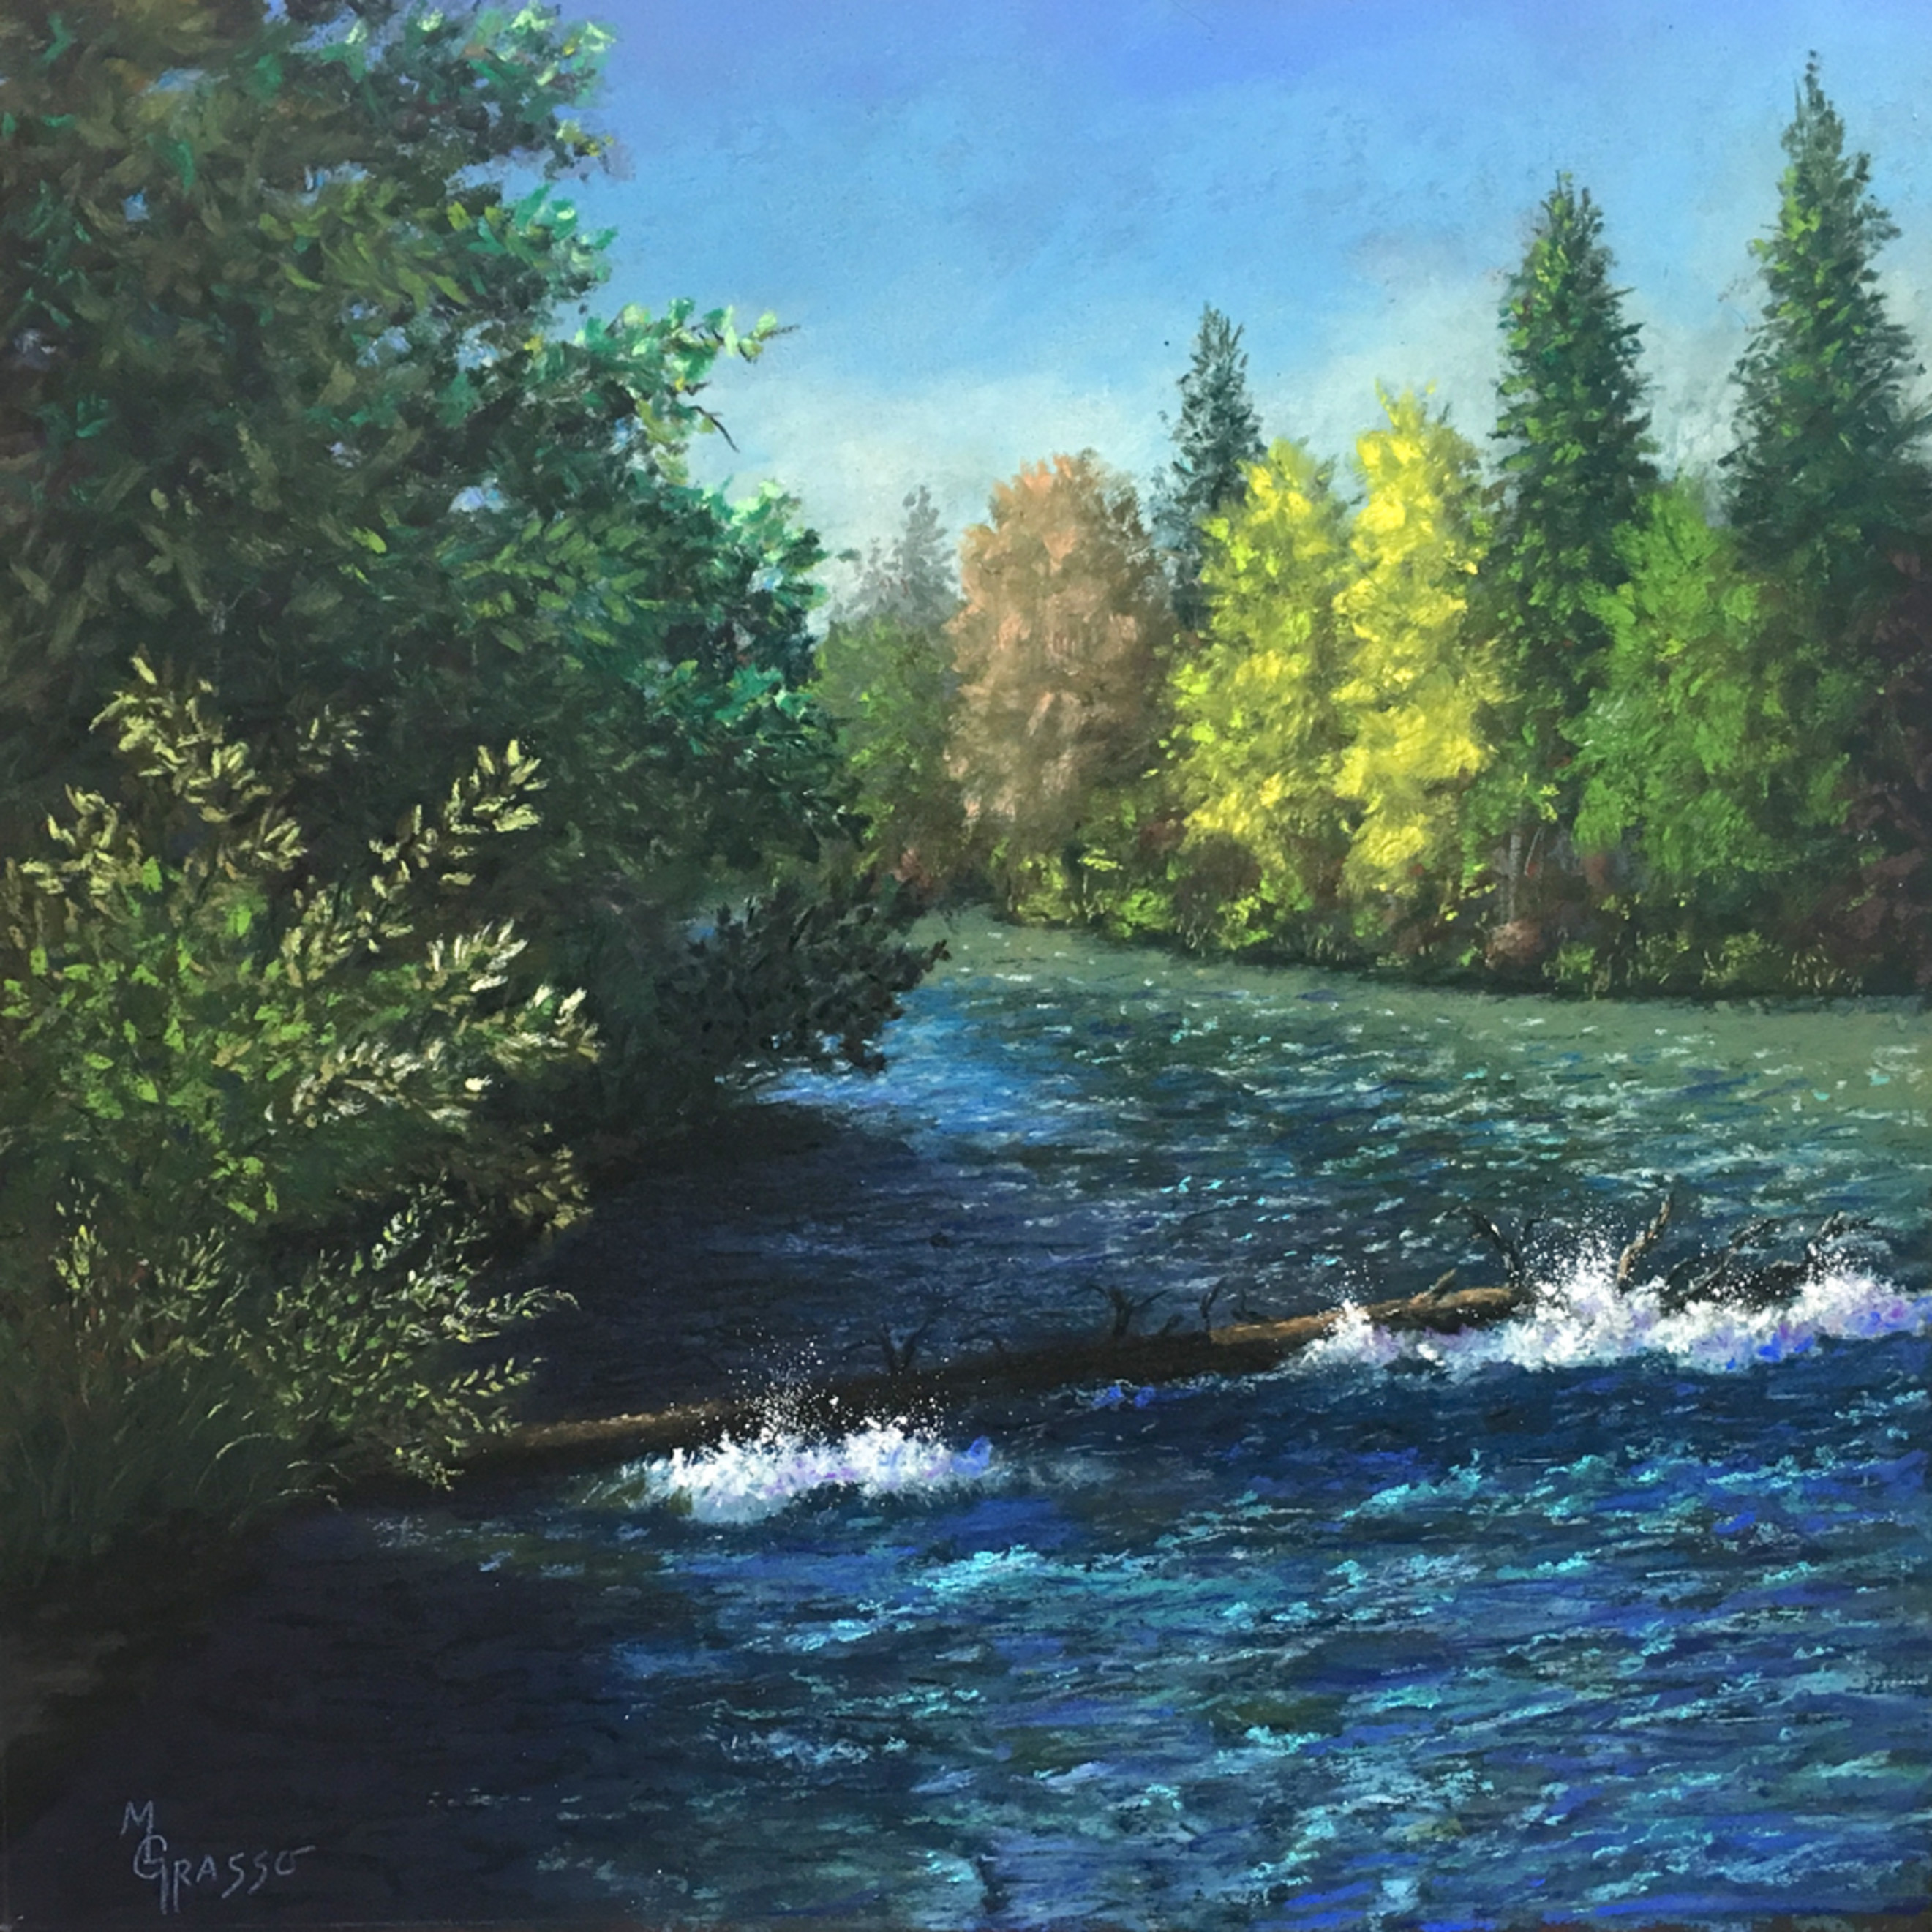 Snake river rapids y79ury